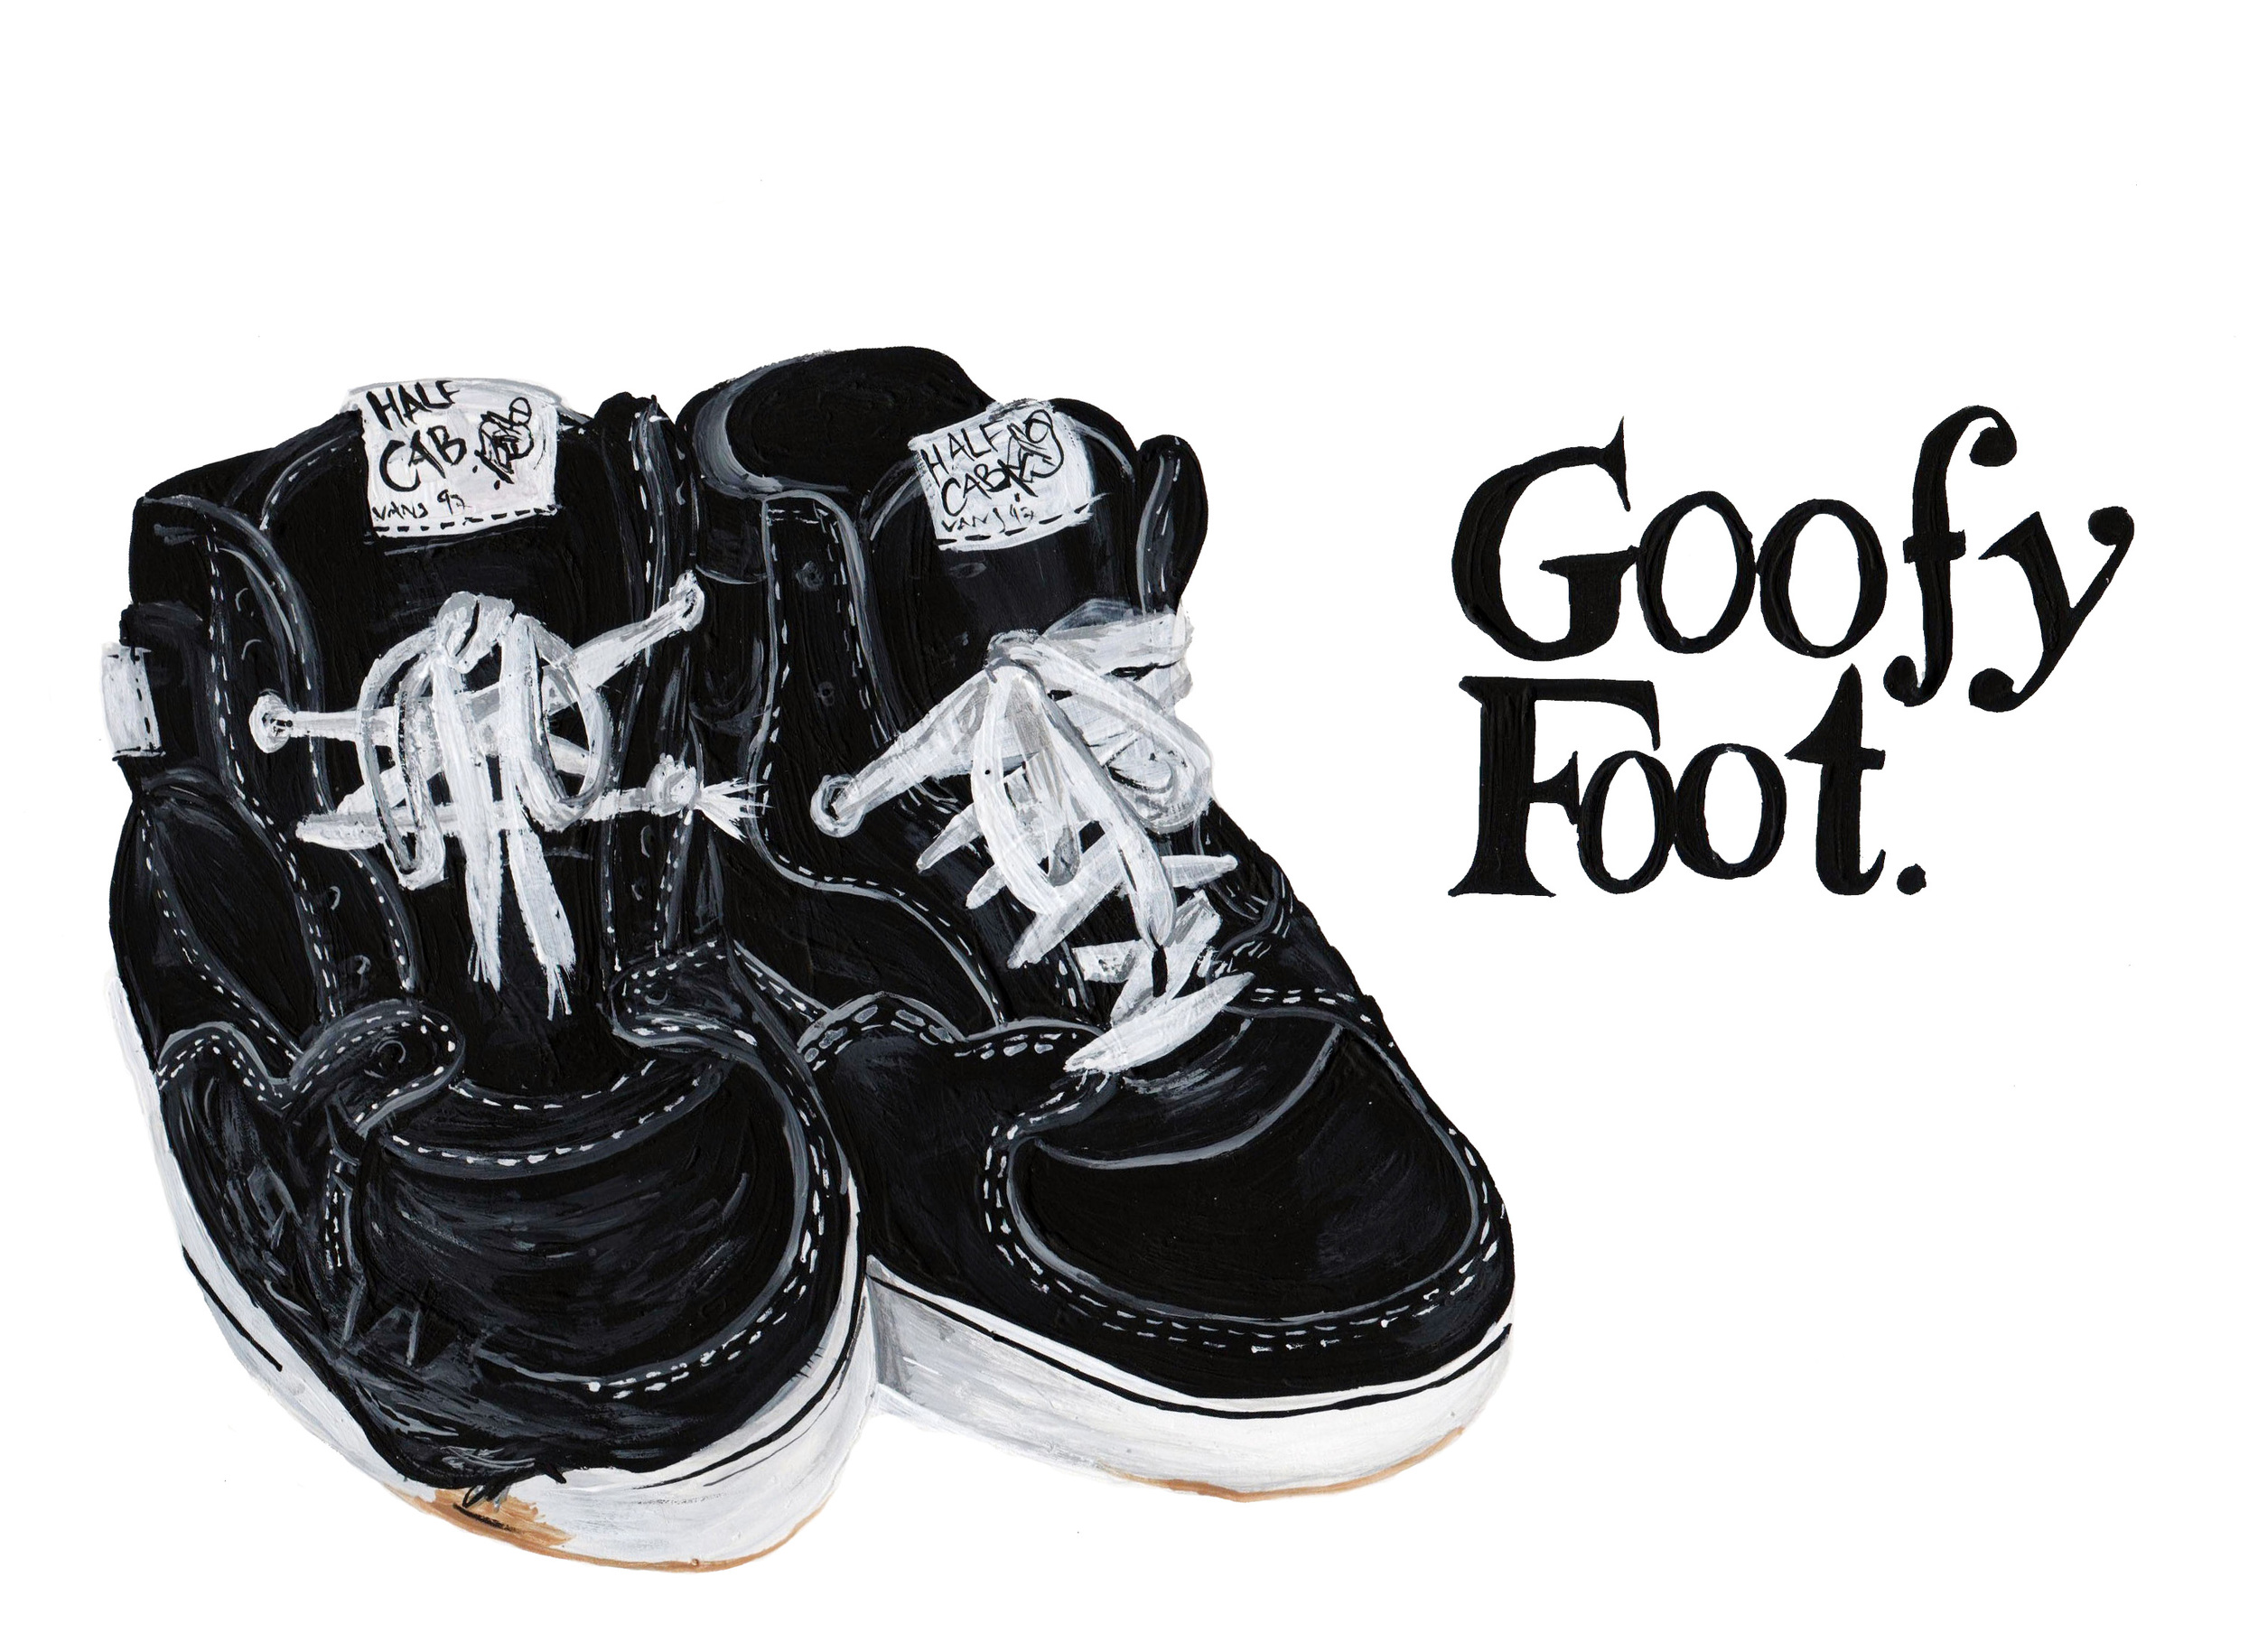 Goofy Foot.jpg